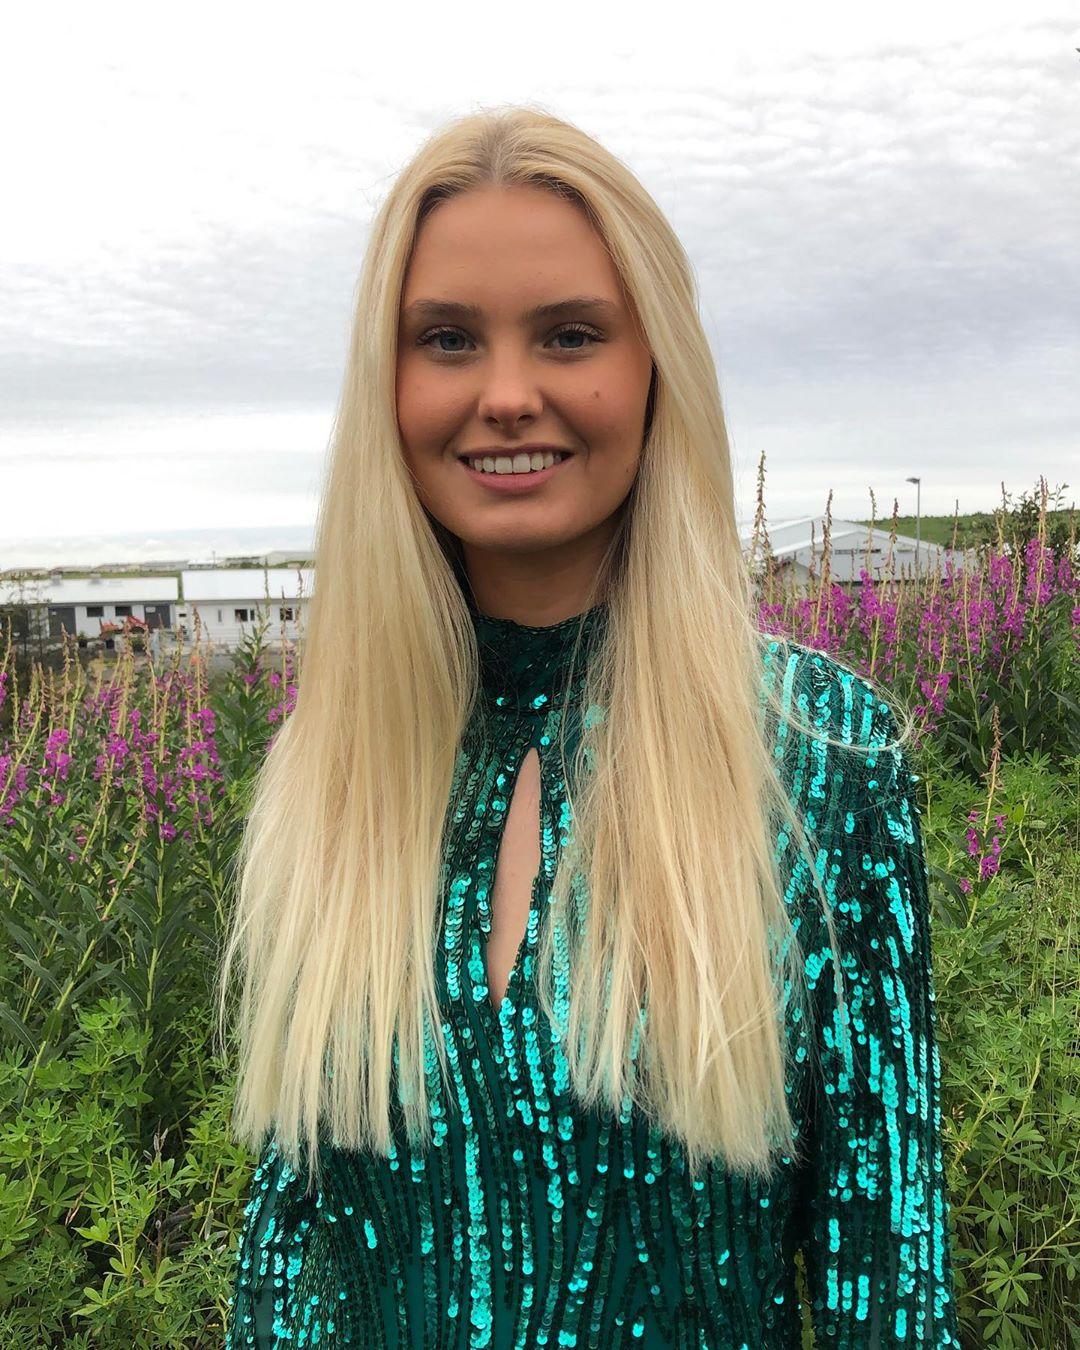 candidatas a miss iceland 2020. final: 23 oct. - Página 3 Hallaakaren-117744047-181905813344419-650693442262394923-n